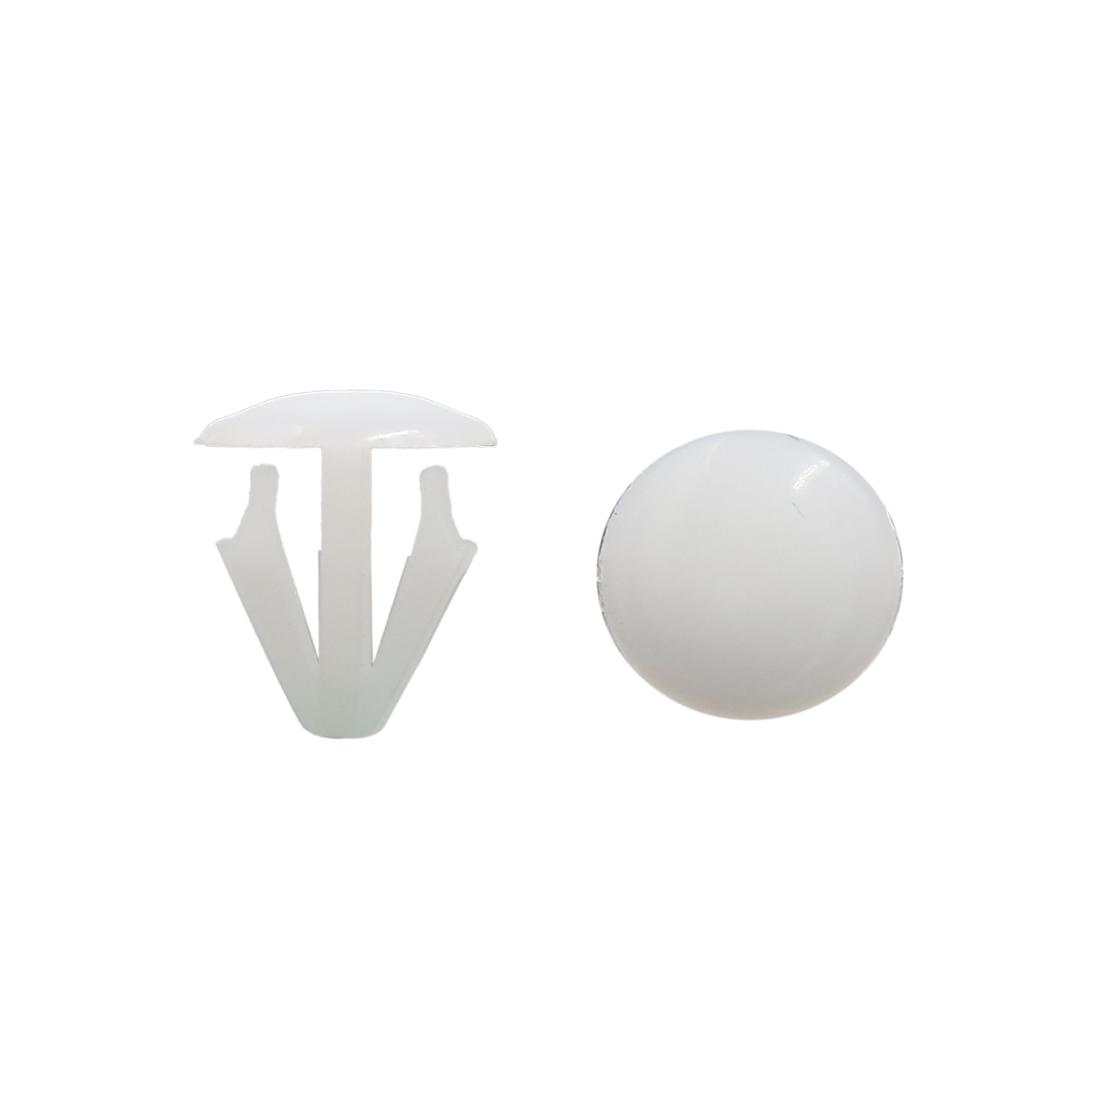 50Pcs White Car Vehicle Plastic Rivets Fastener Door Clips 15mm Hole Dia